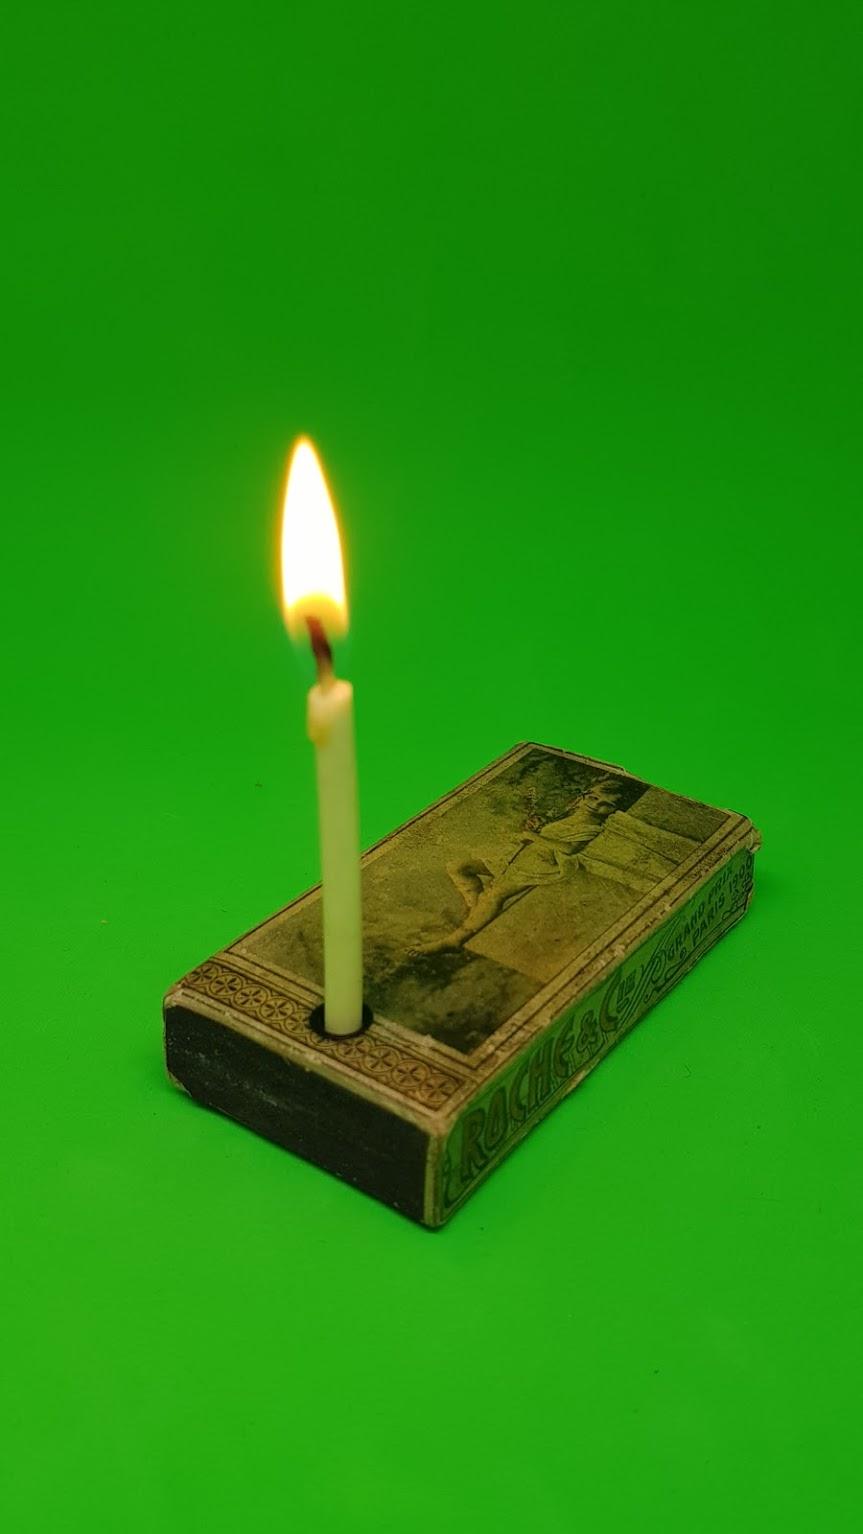 Match candles, Streichholzkerzen, Roche & Cie., Rue Caumartin 7, Paris, Grand Prix Paris 1900, Made in Belgium